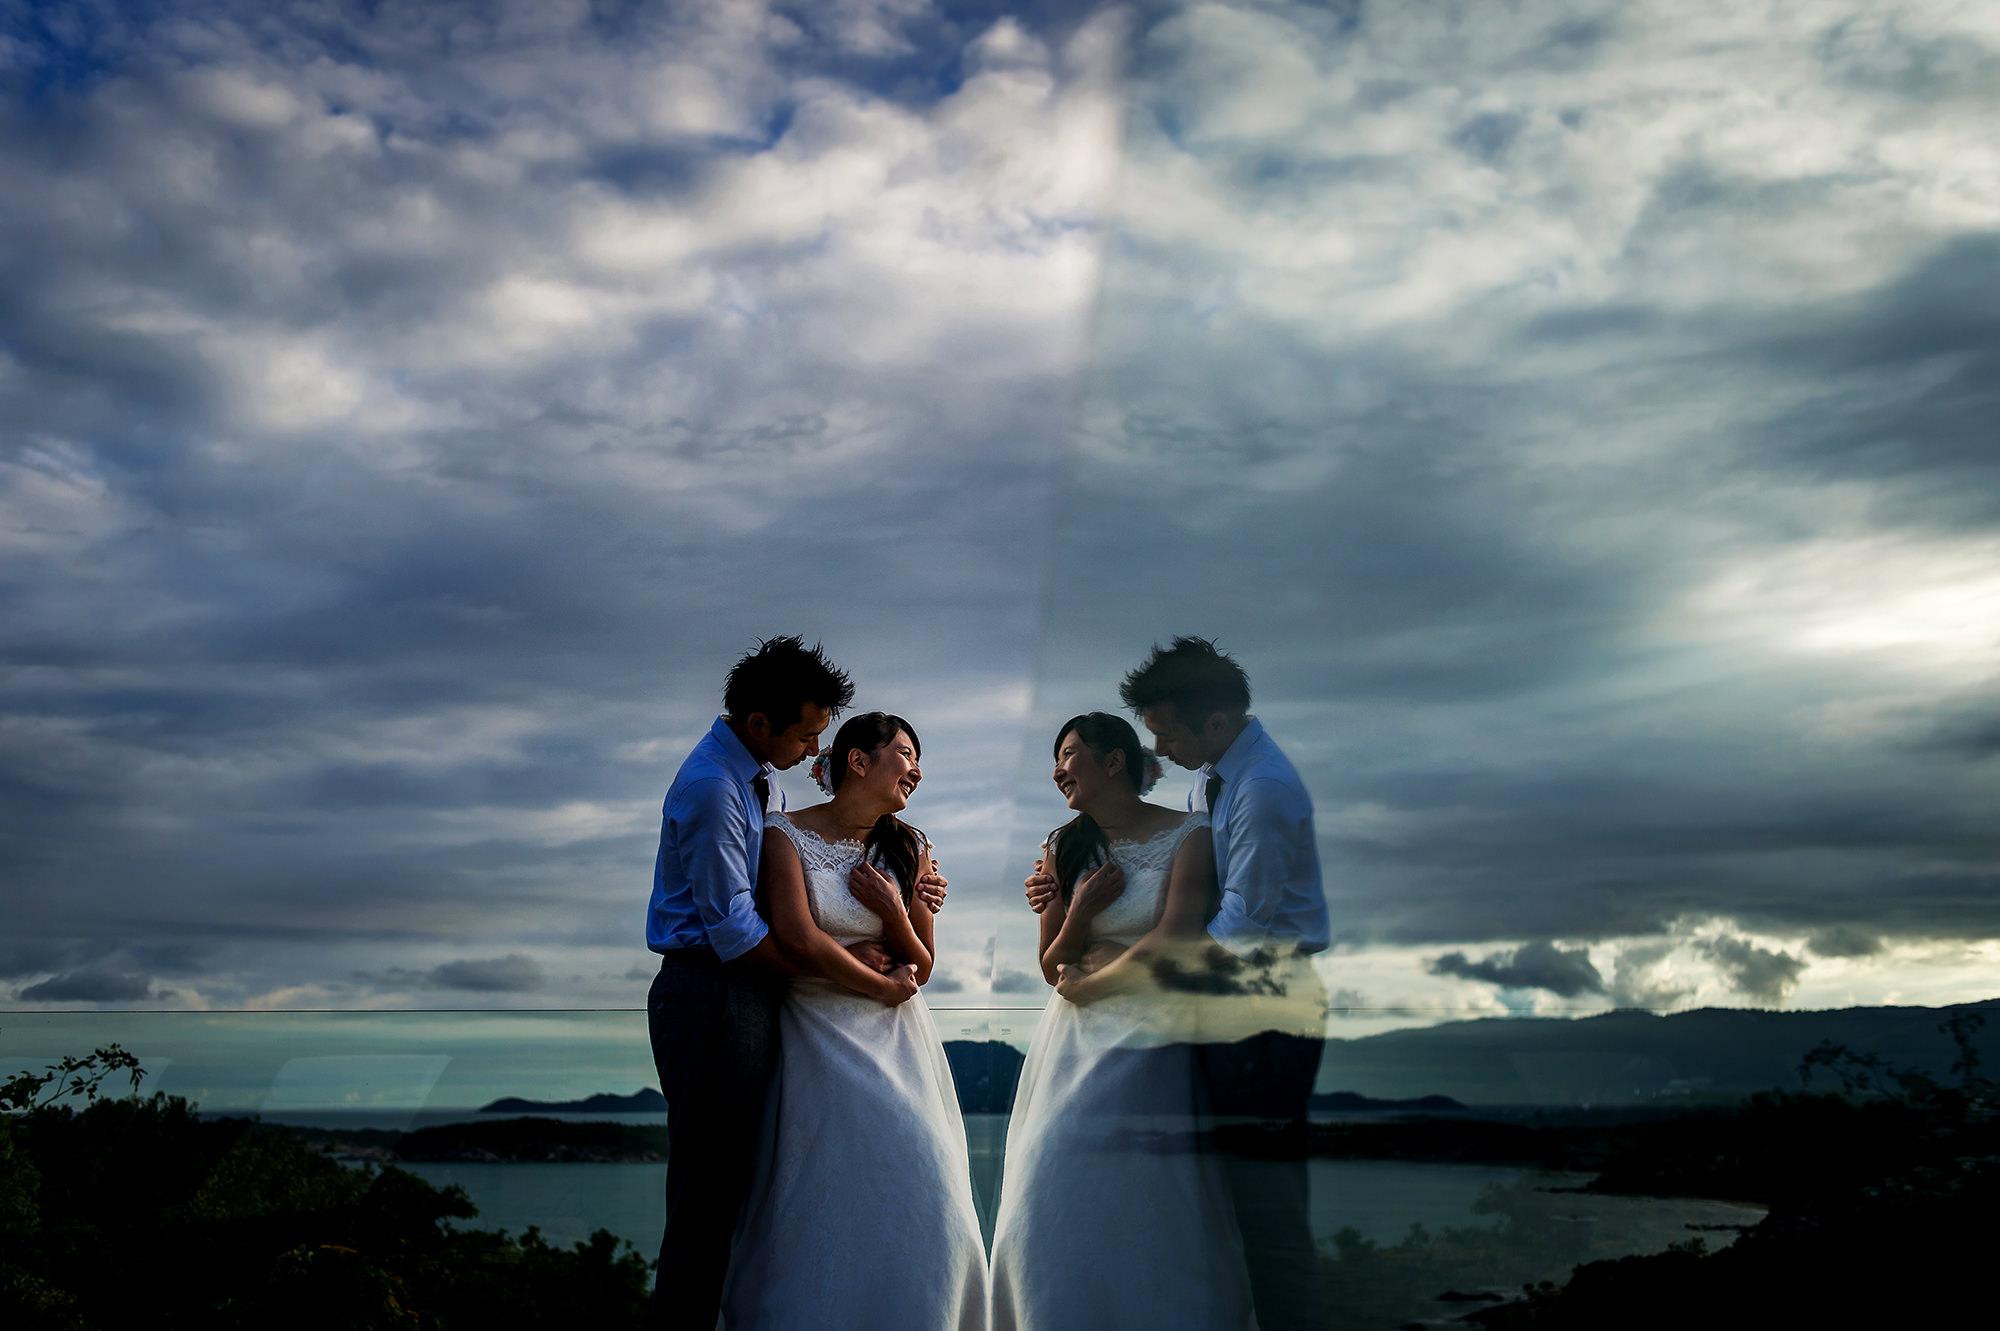 Portrait of bride and groom against lake, by Davina Plus Daniel